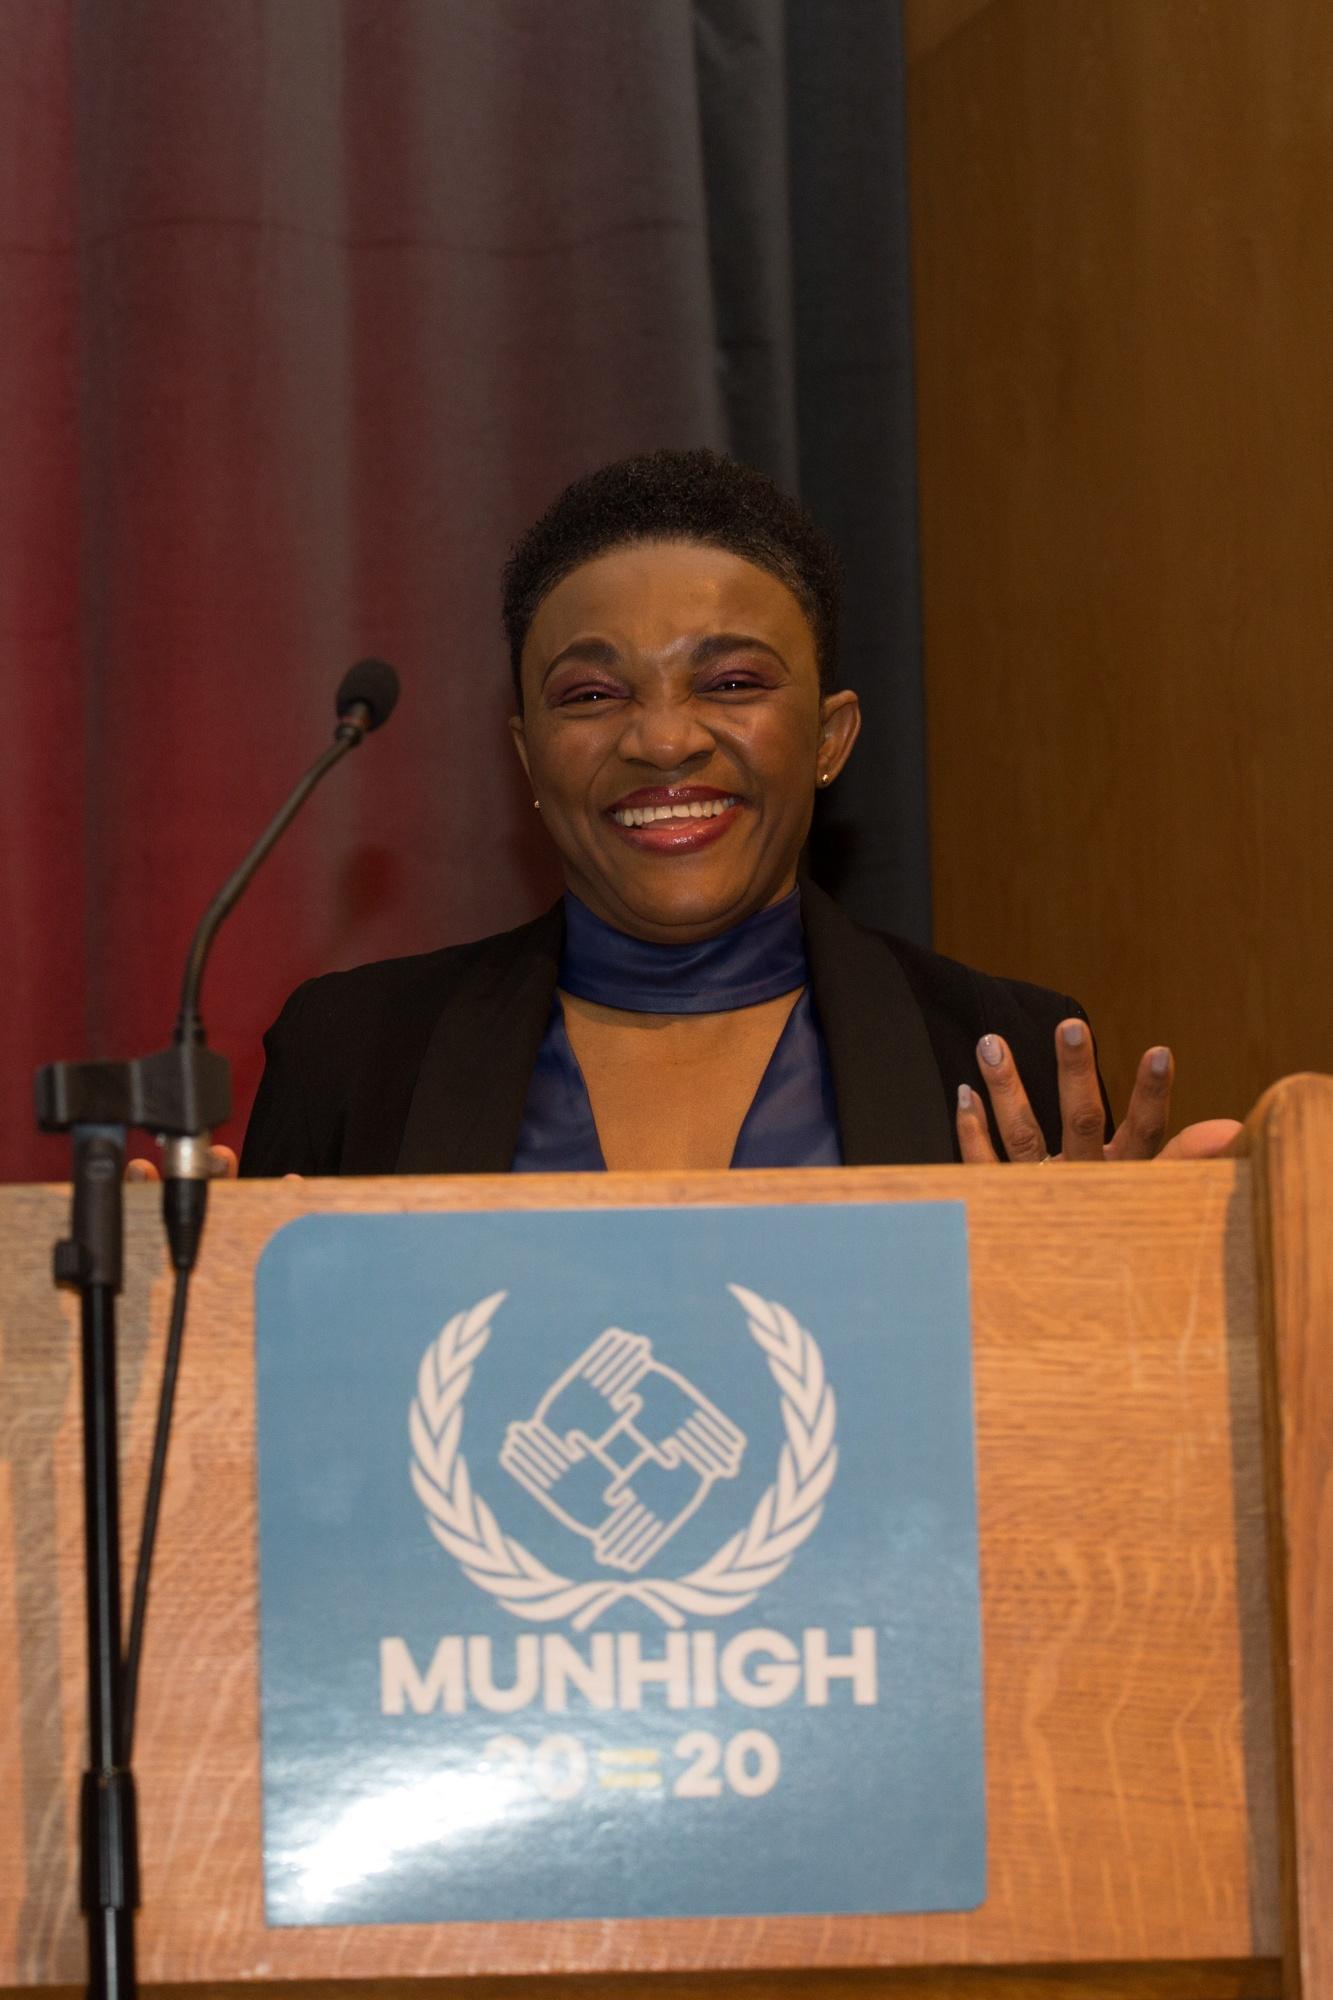 Guest Speaker - Dr Sylvia Likambi